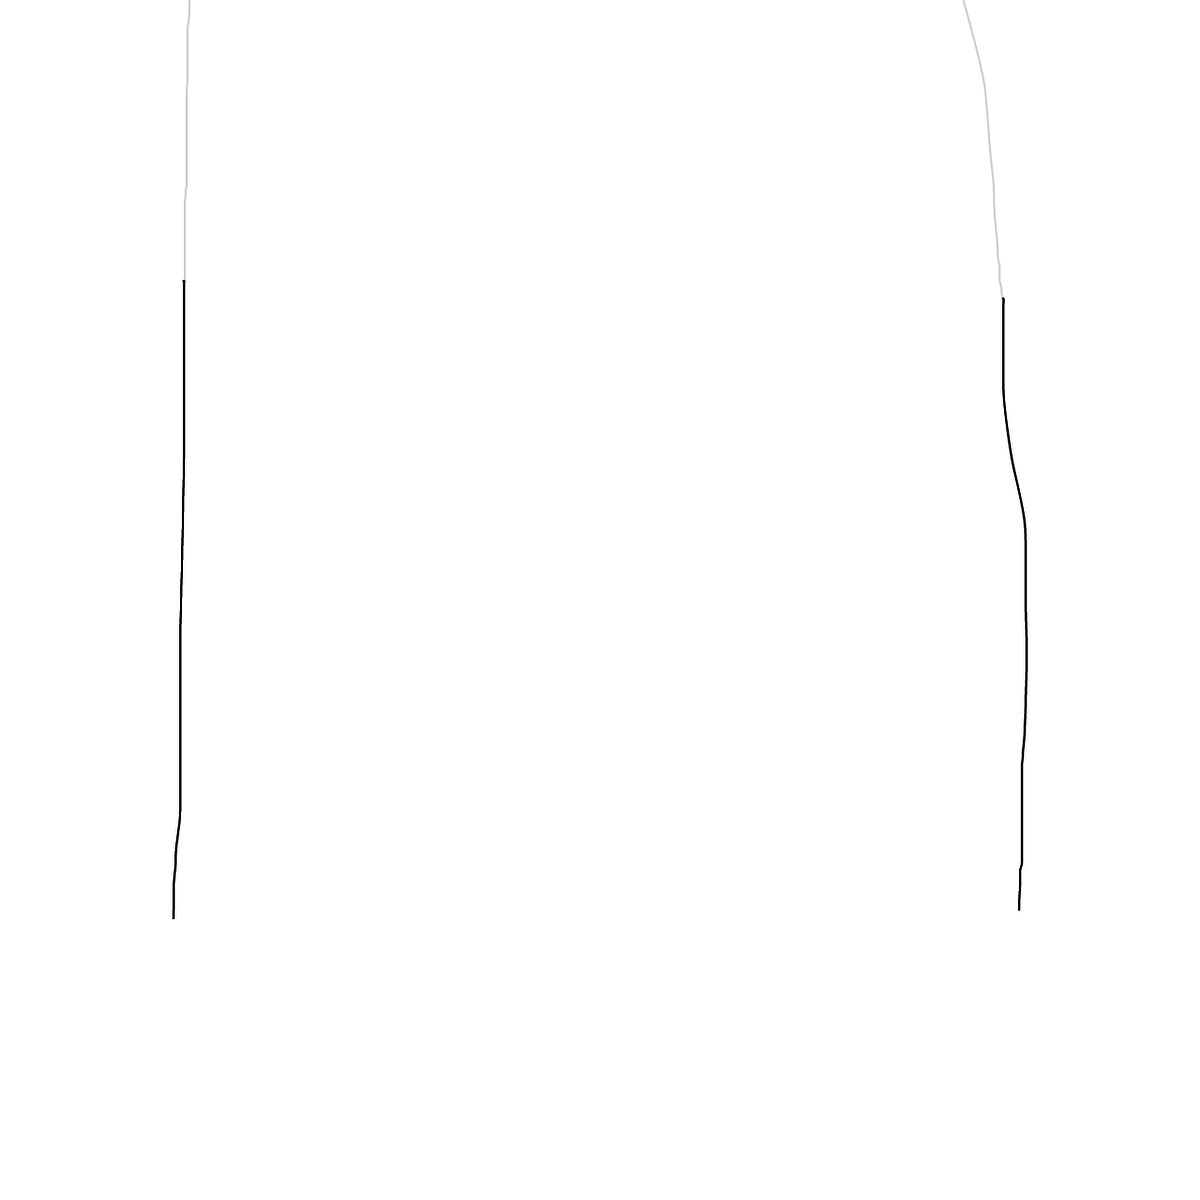 BAAAM drawing#19576 lat:40.4807357788085940lng: -74.0054855346679700